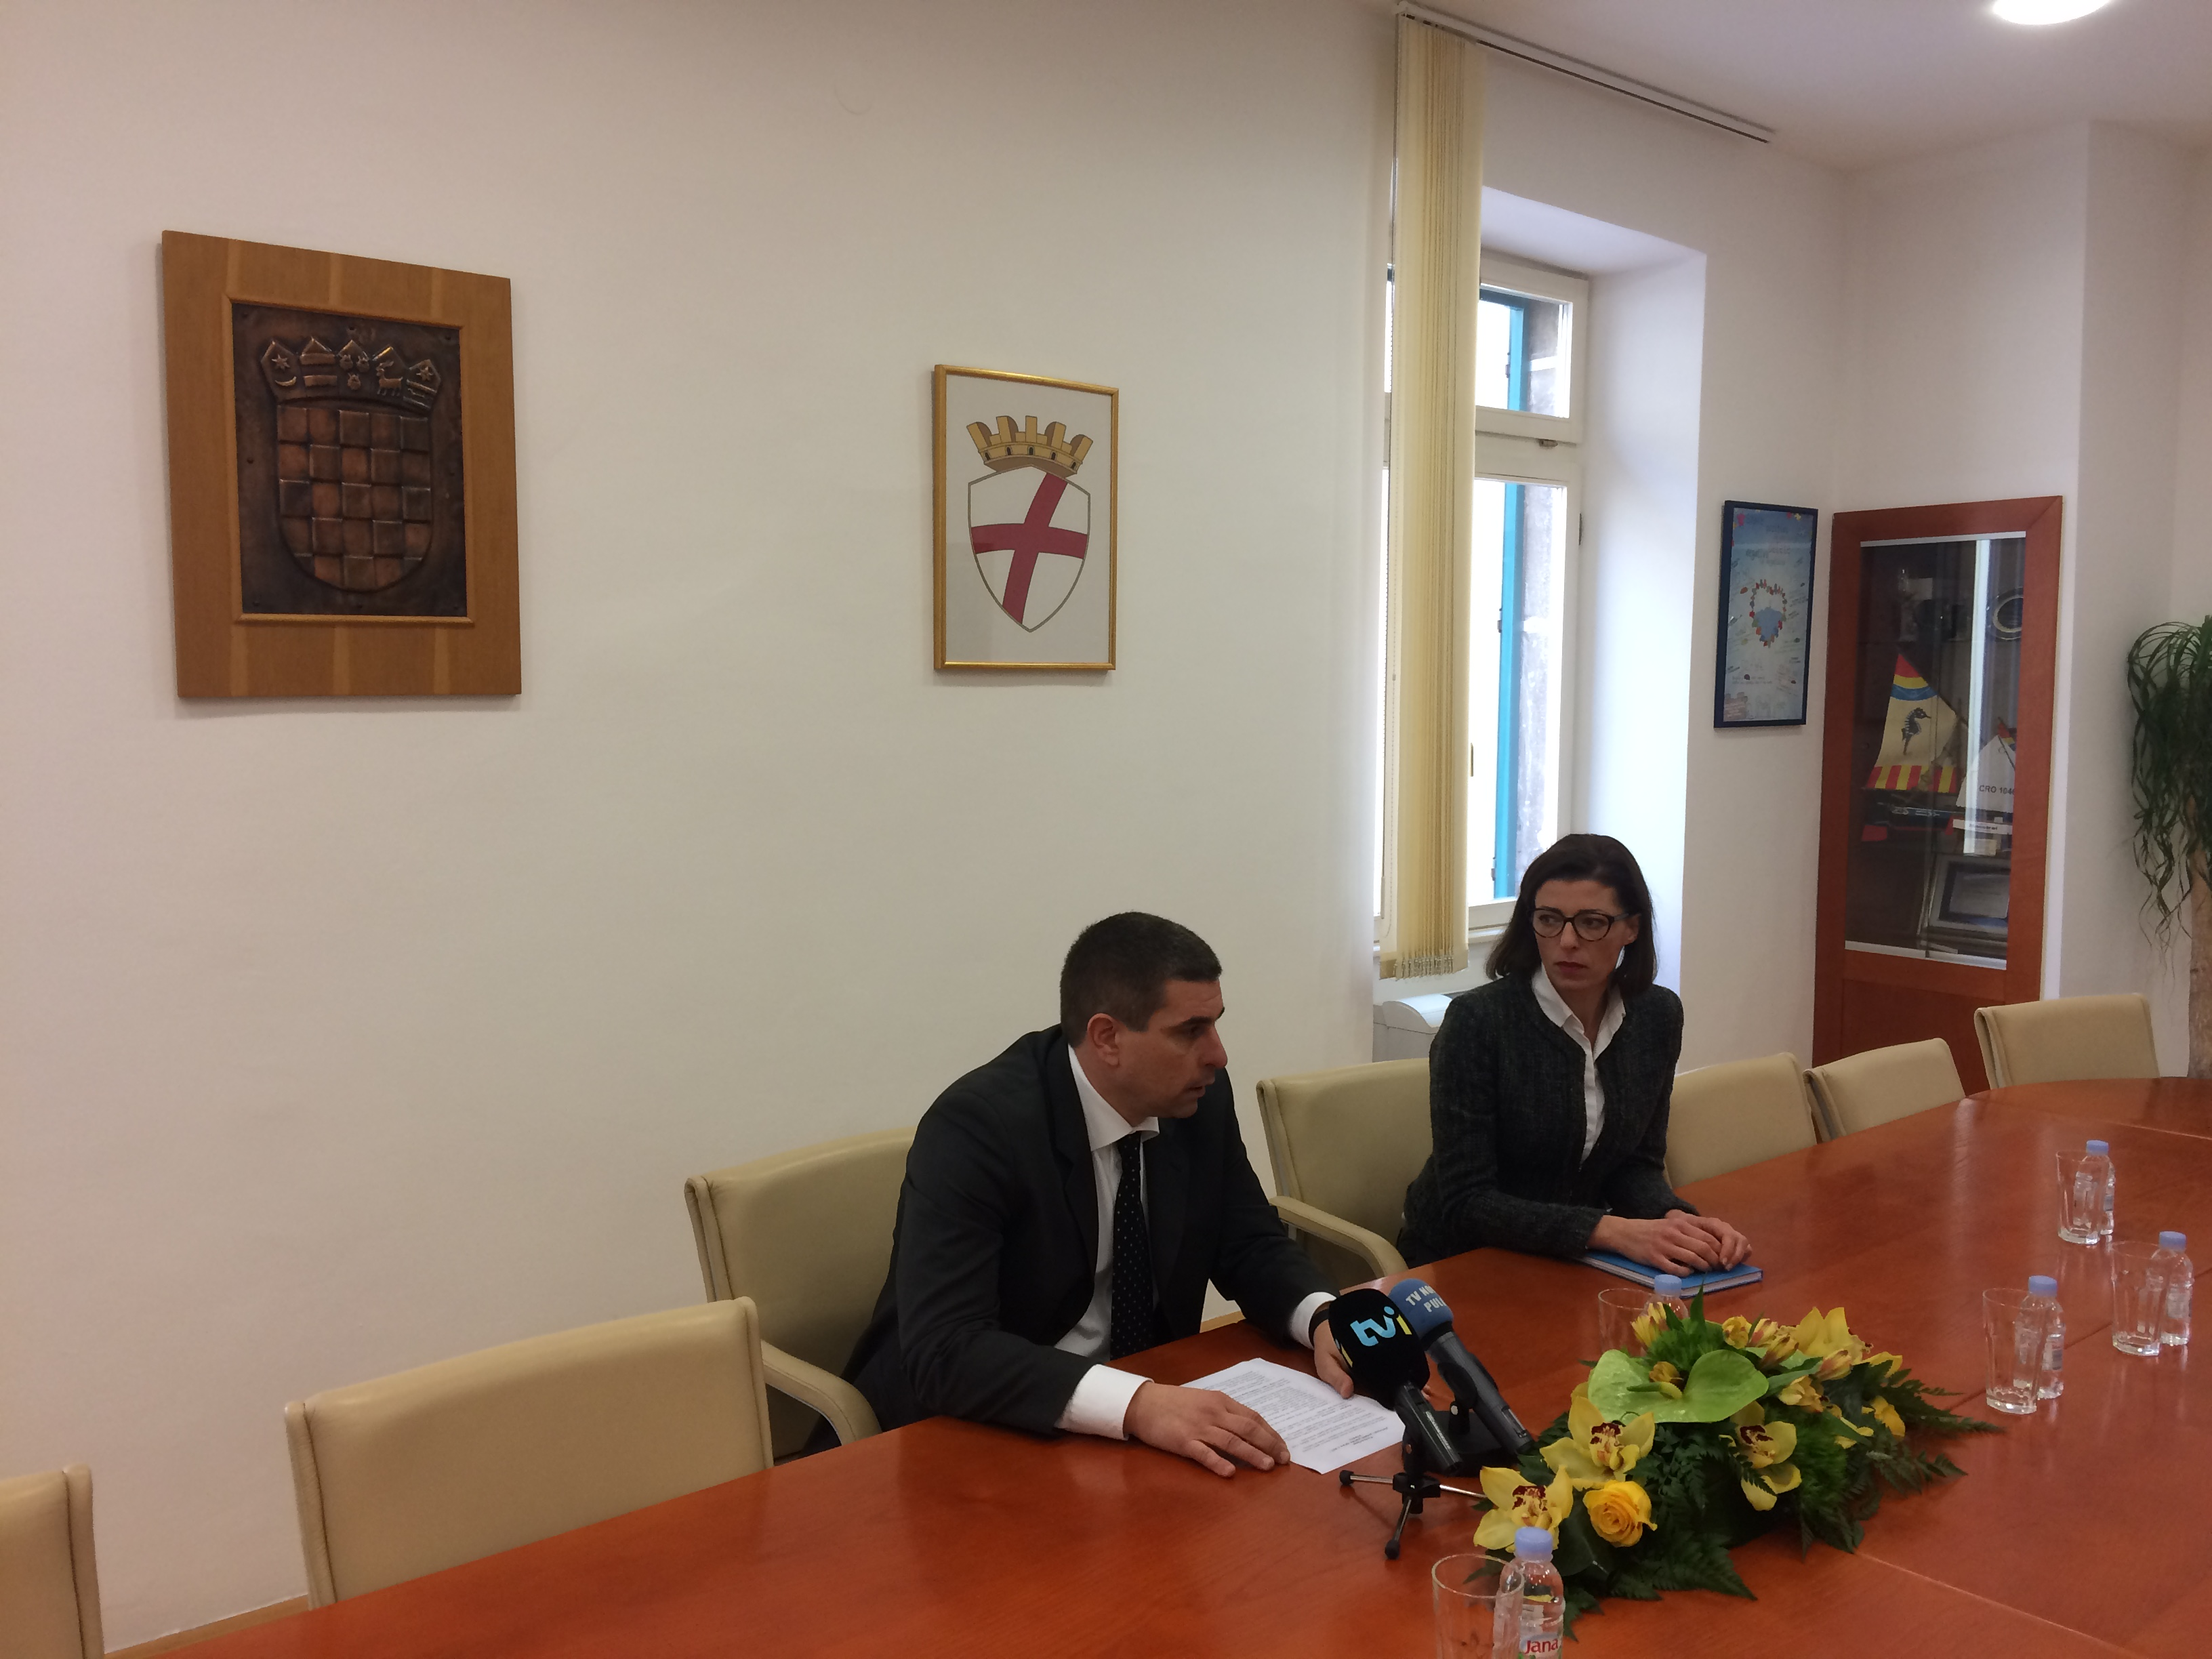 Conferenza stampa del sindaco Marko Paliaga